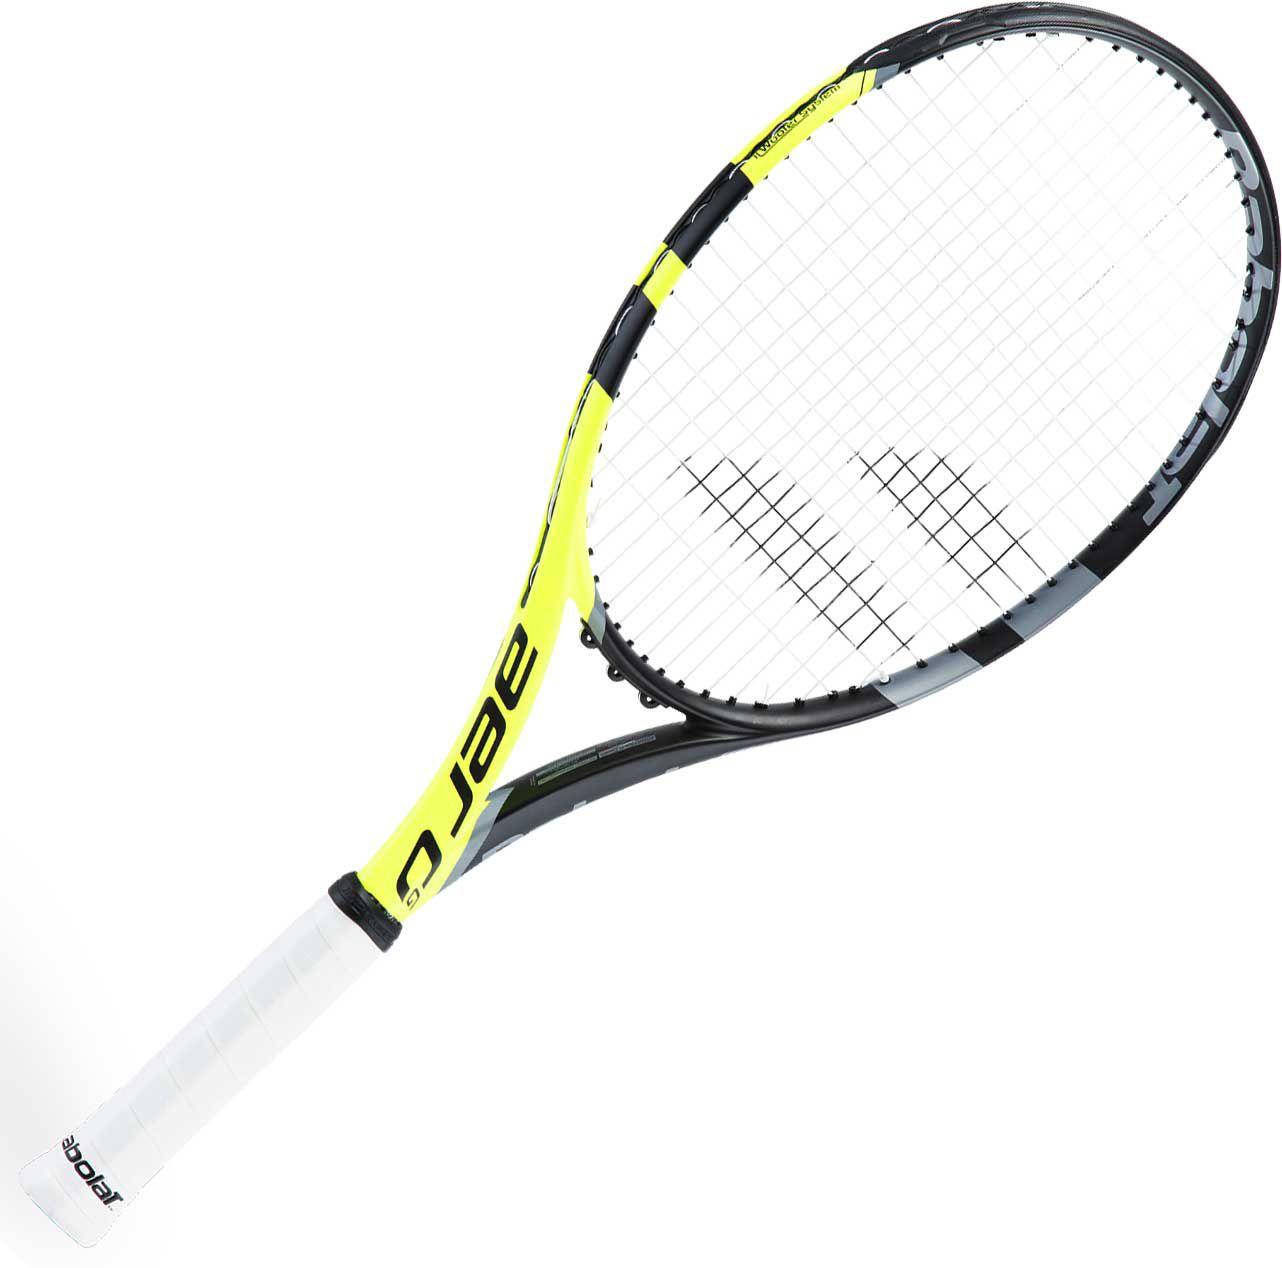 Babolat Aero G Pro Tennis Racquet by Babolat